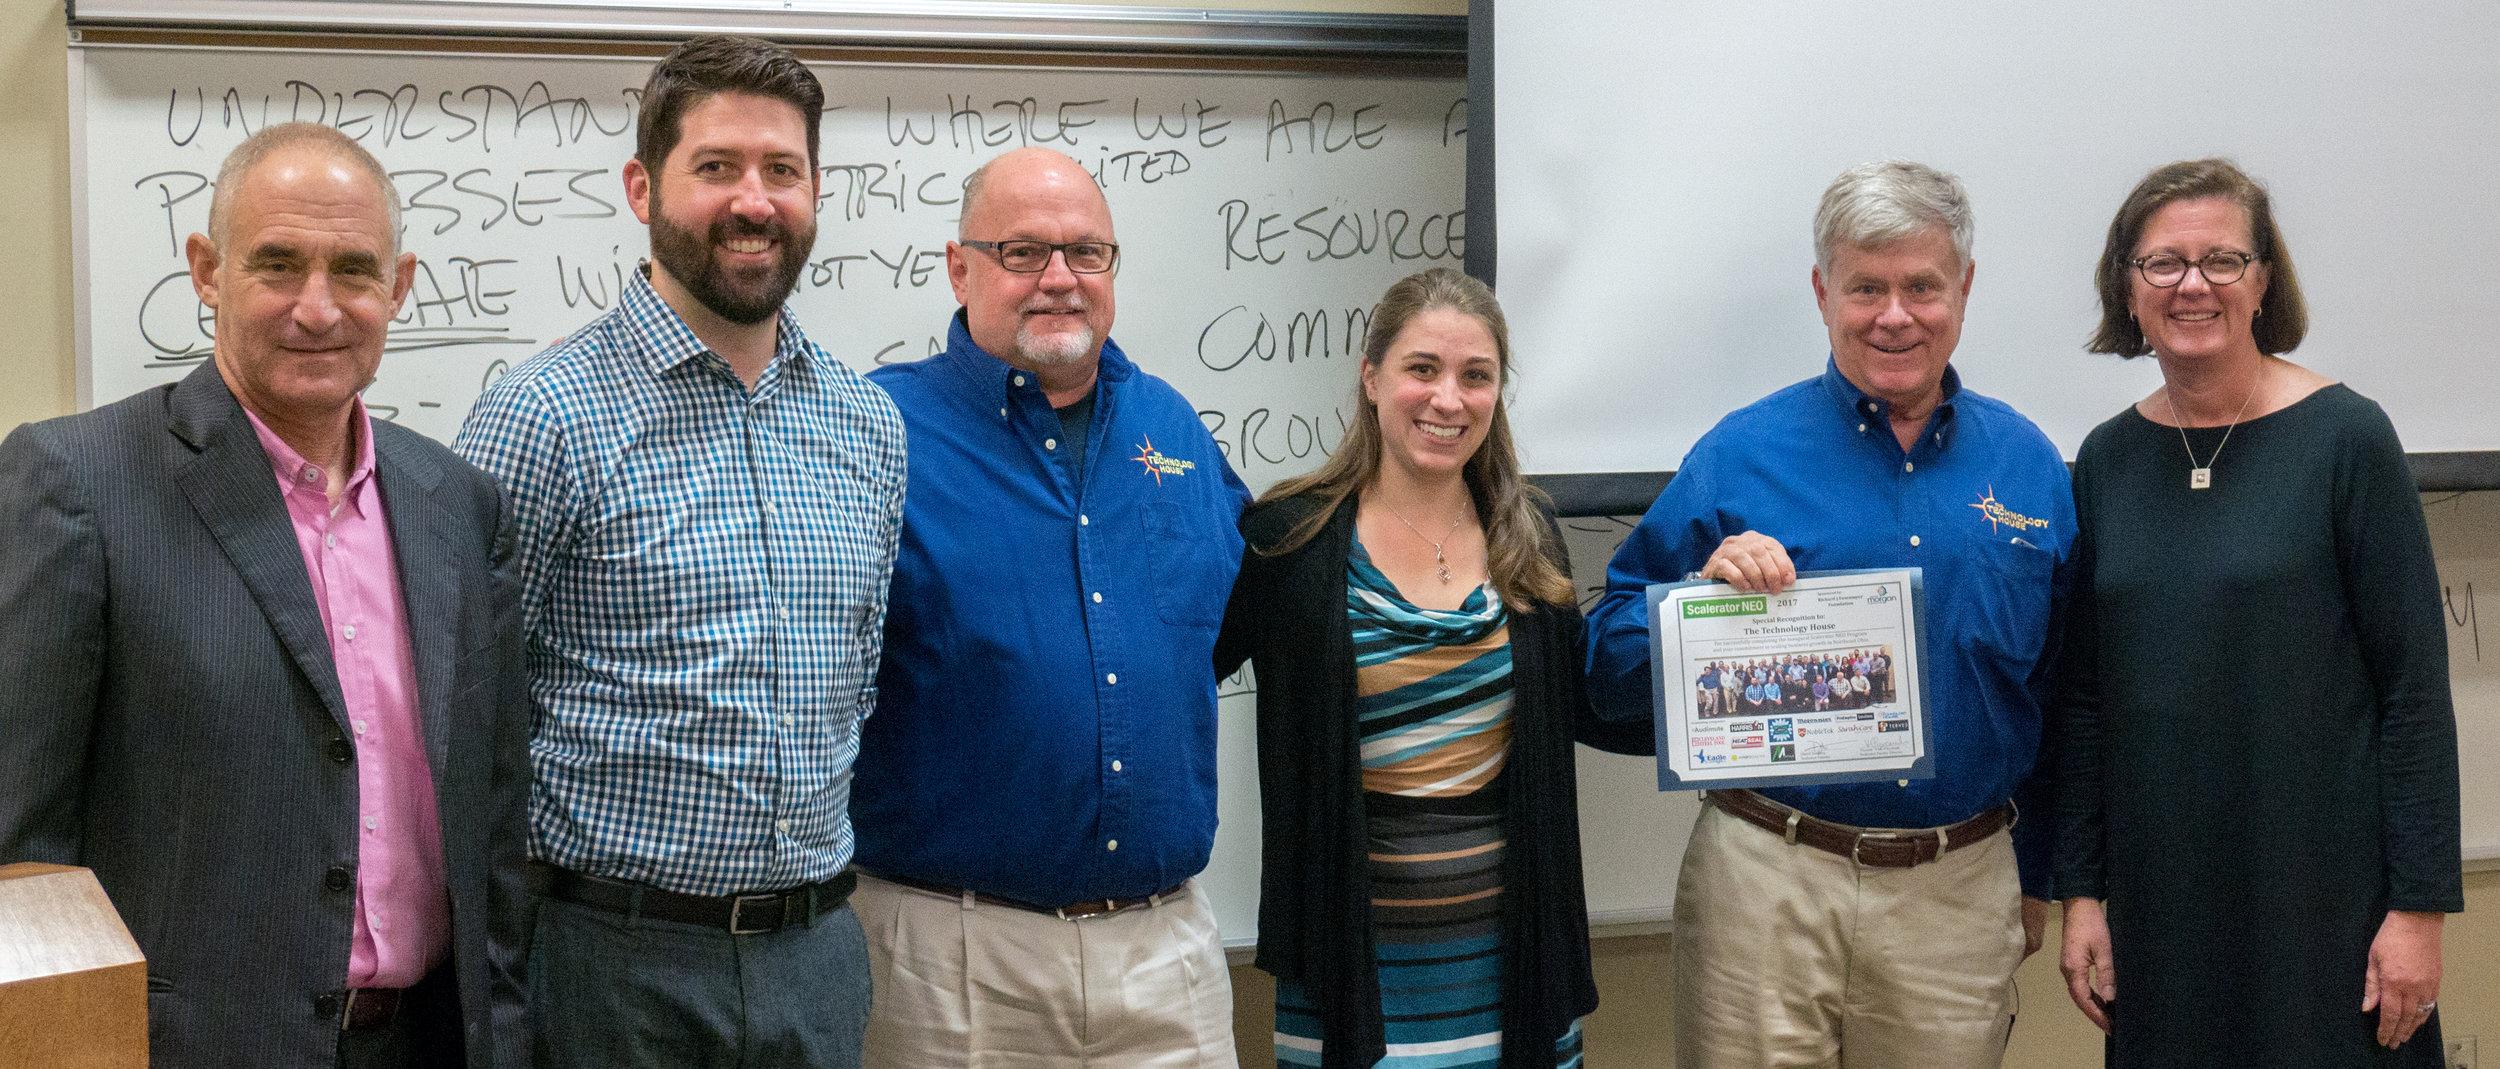 Dan Isenberg  (Scalerator Founder);  Greg Cebular, Mike Wright, Lauren Good , and  Chip Gear  (The Technology House);  Deborah Hoover  (President, Burton D. Morgan Foundation)